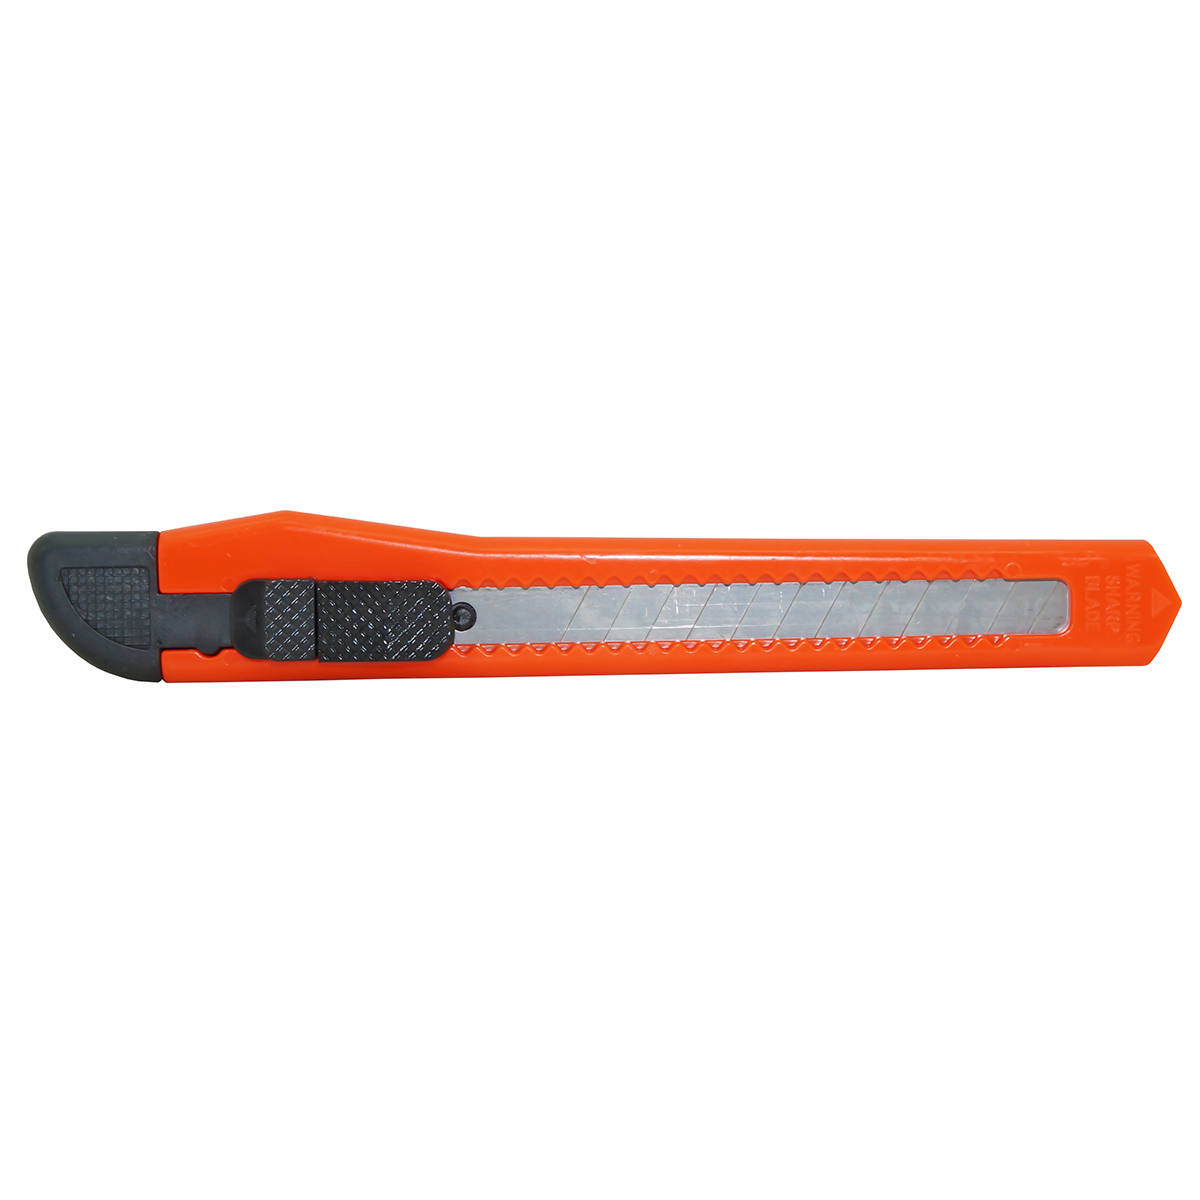 Estilete Estreito Lâmina de 9mm com Trava de Segurança Masterprint MP450